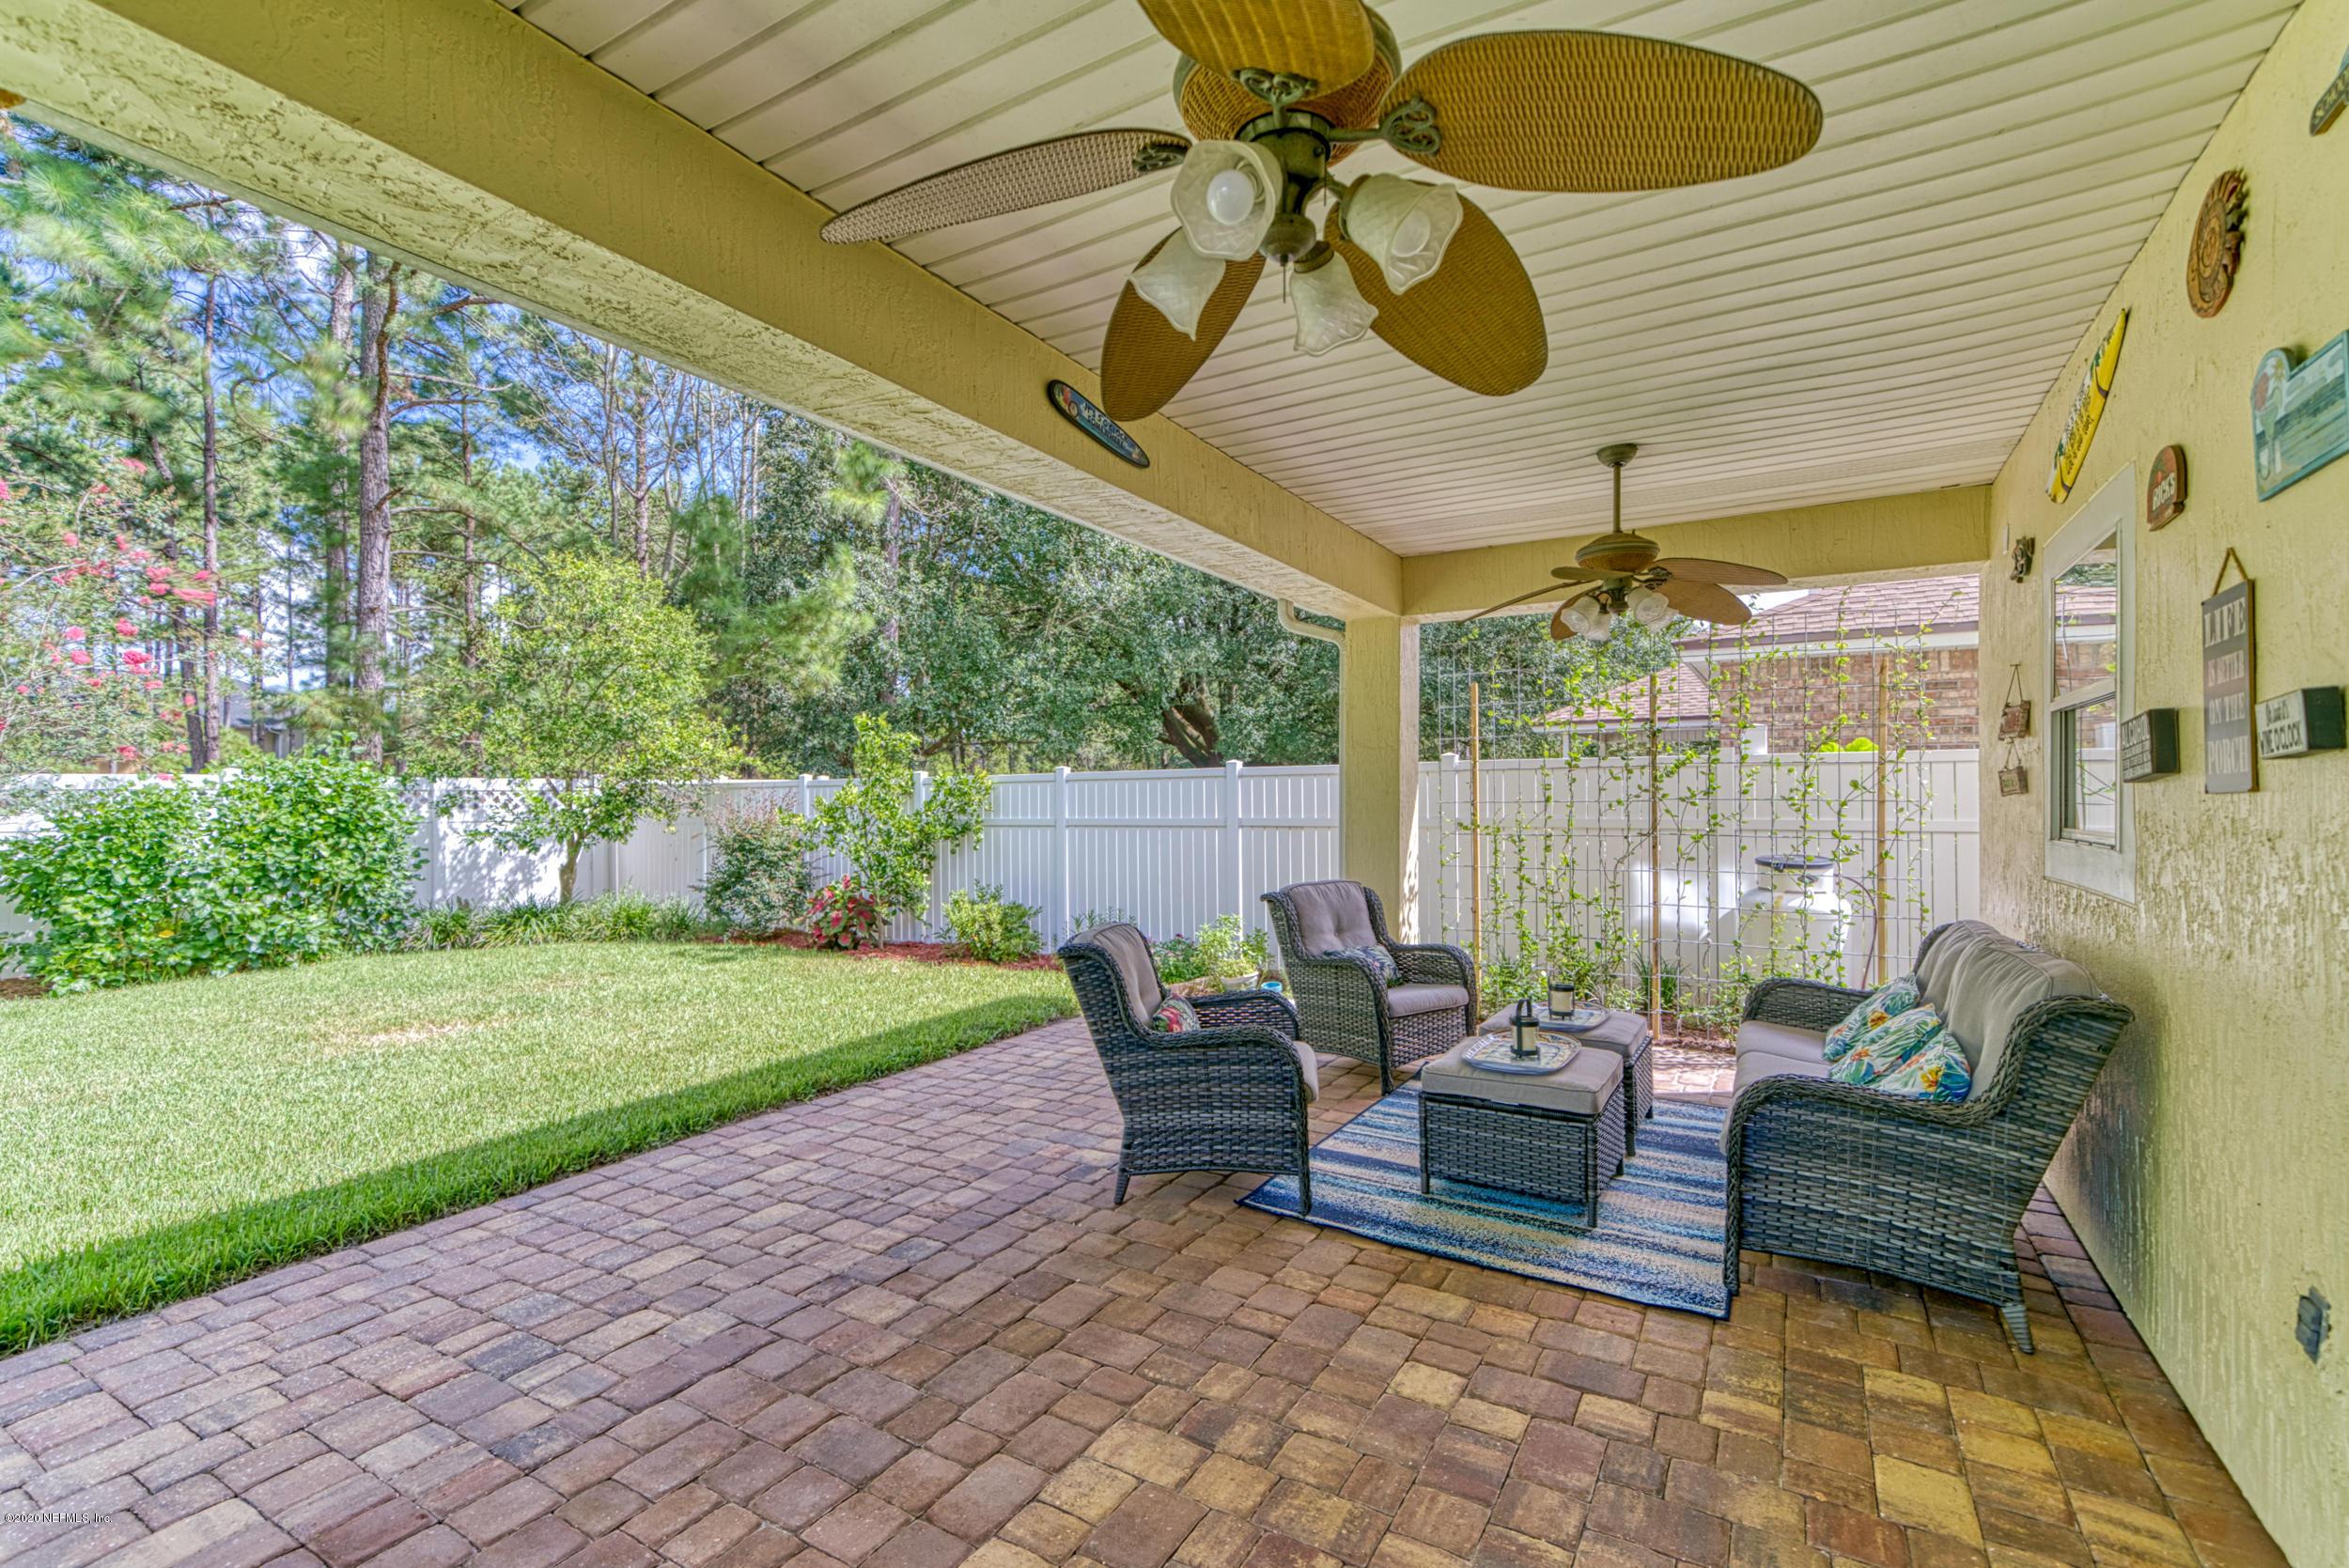 1723 CANOPY OAKS, ORANGE PARK, FLORIDA 32065, 5 Bedrooms Bedrooms, ,3 BathroomsBathrooms,Residential,For sale,CANOPY OAKS,1065264